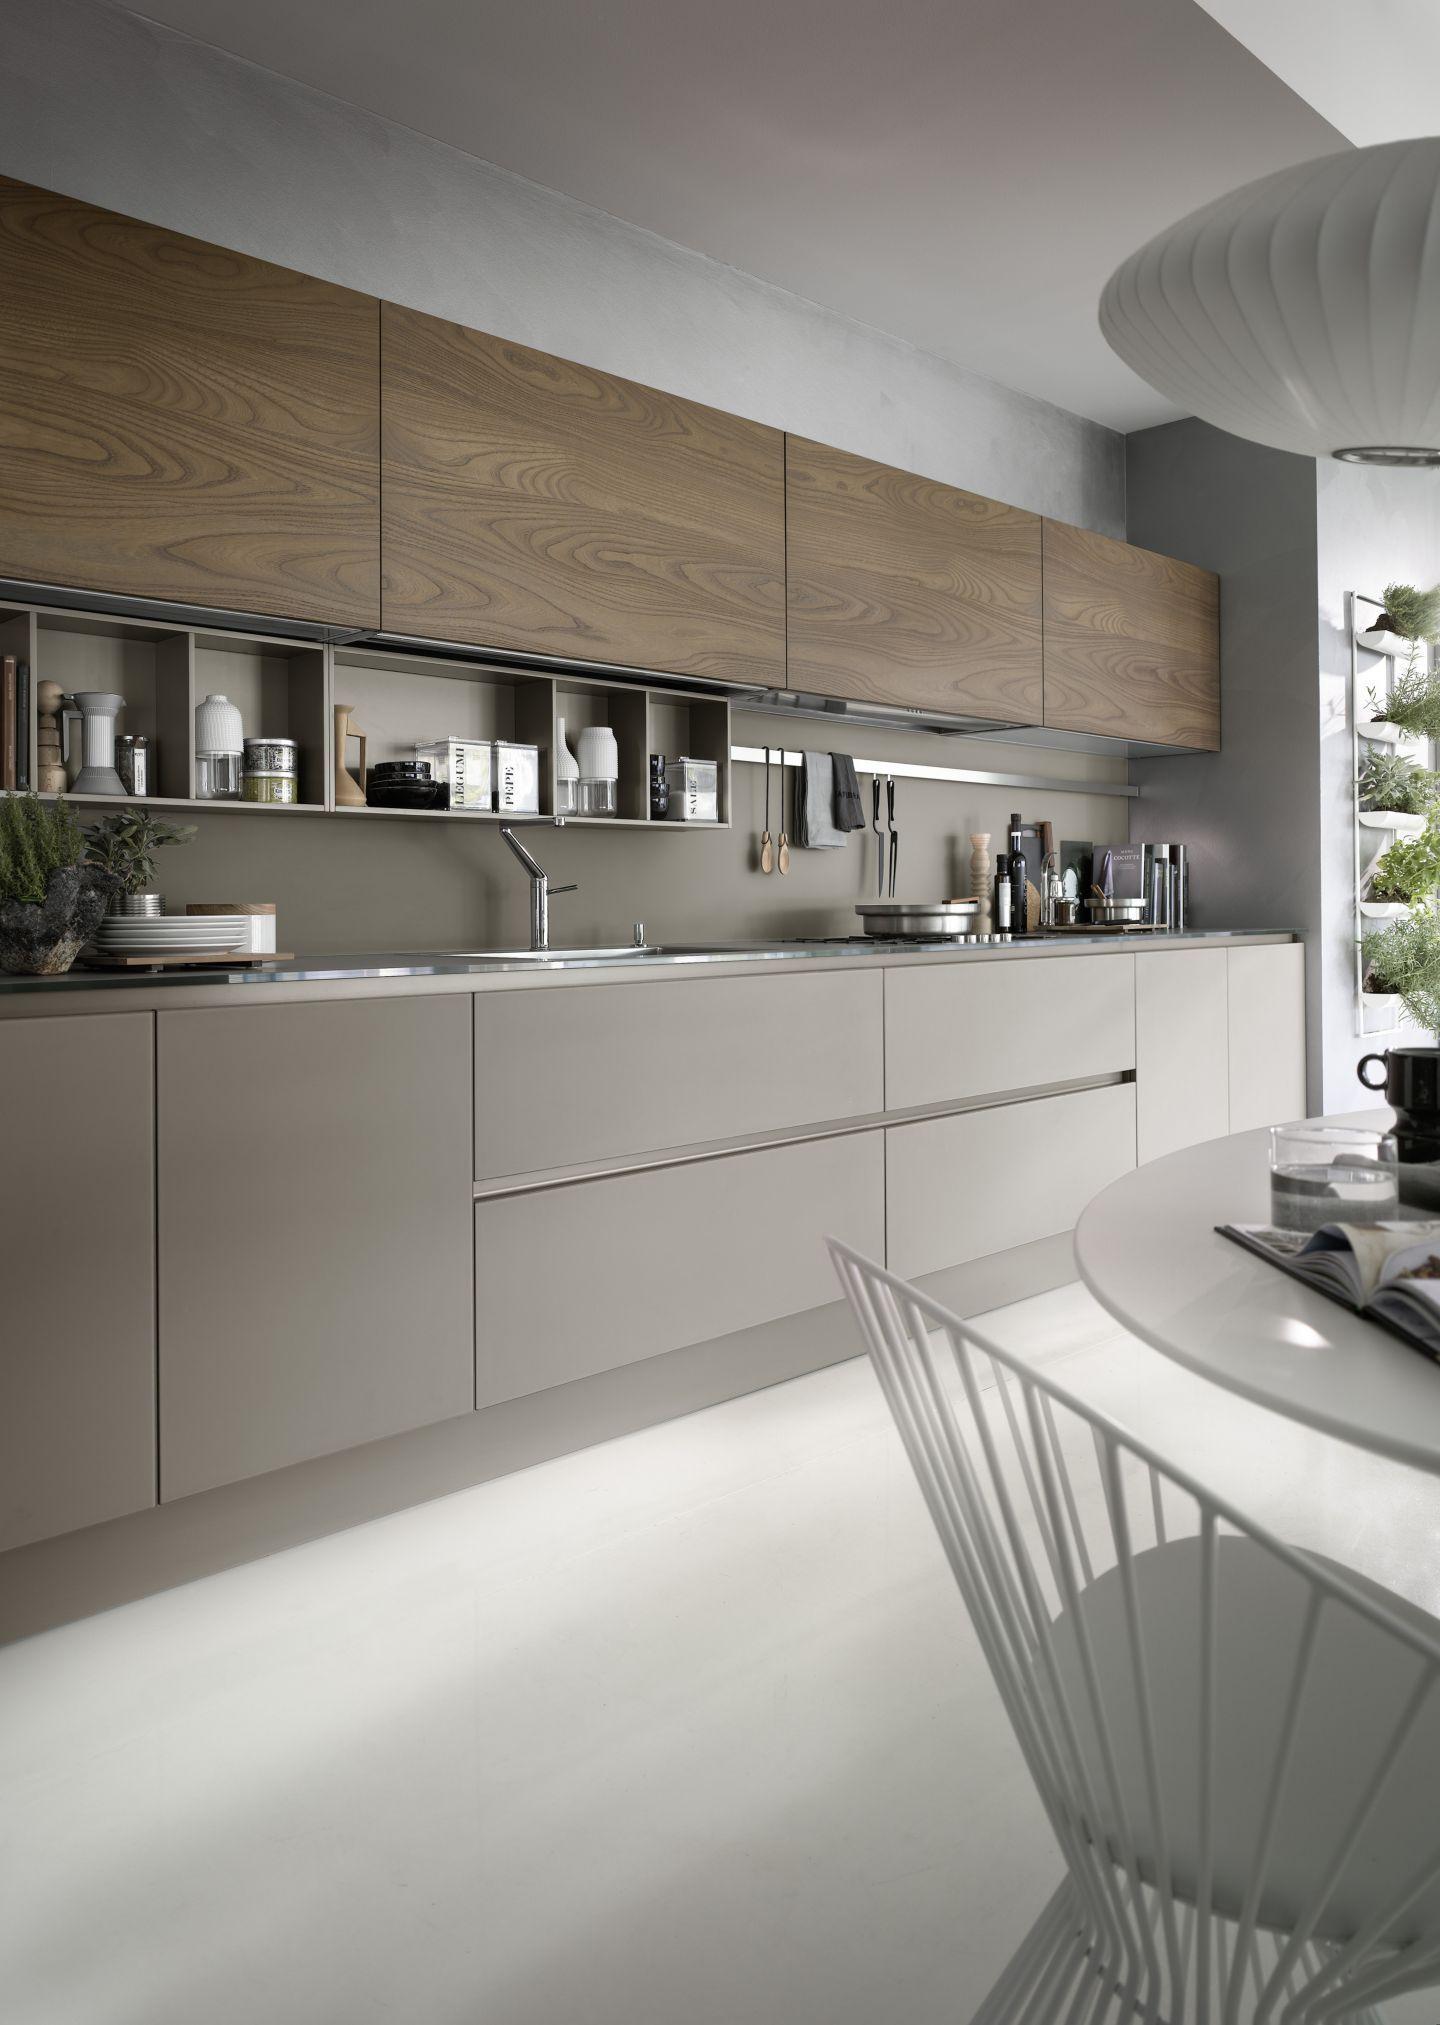 Une #cuisine #moderne Tout En Longueur. #brun Http://www